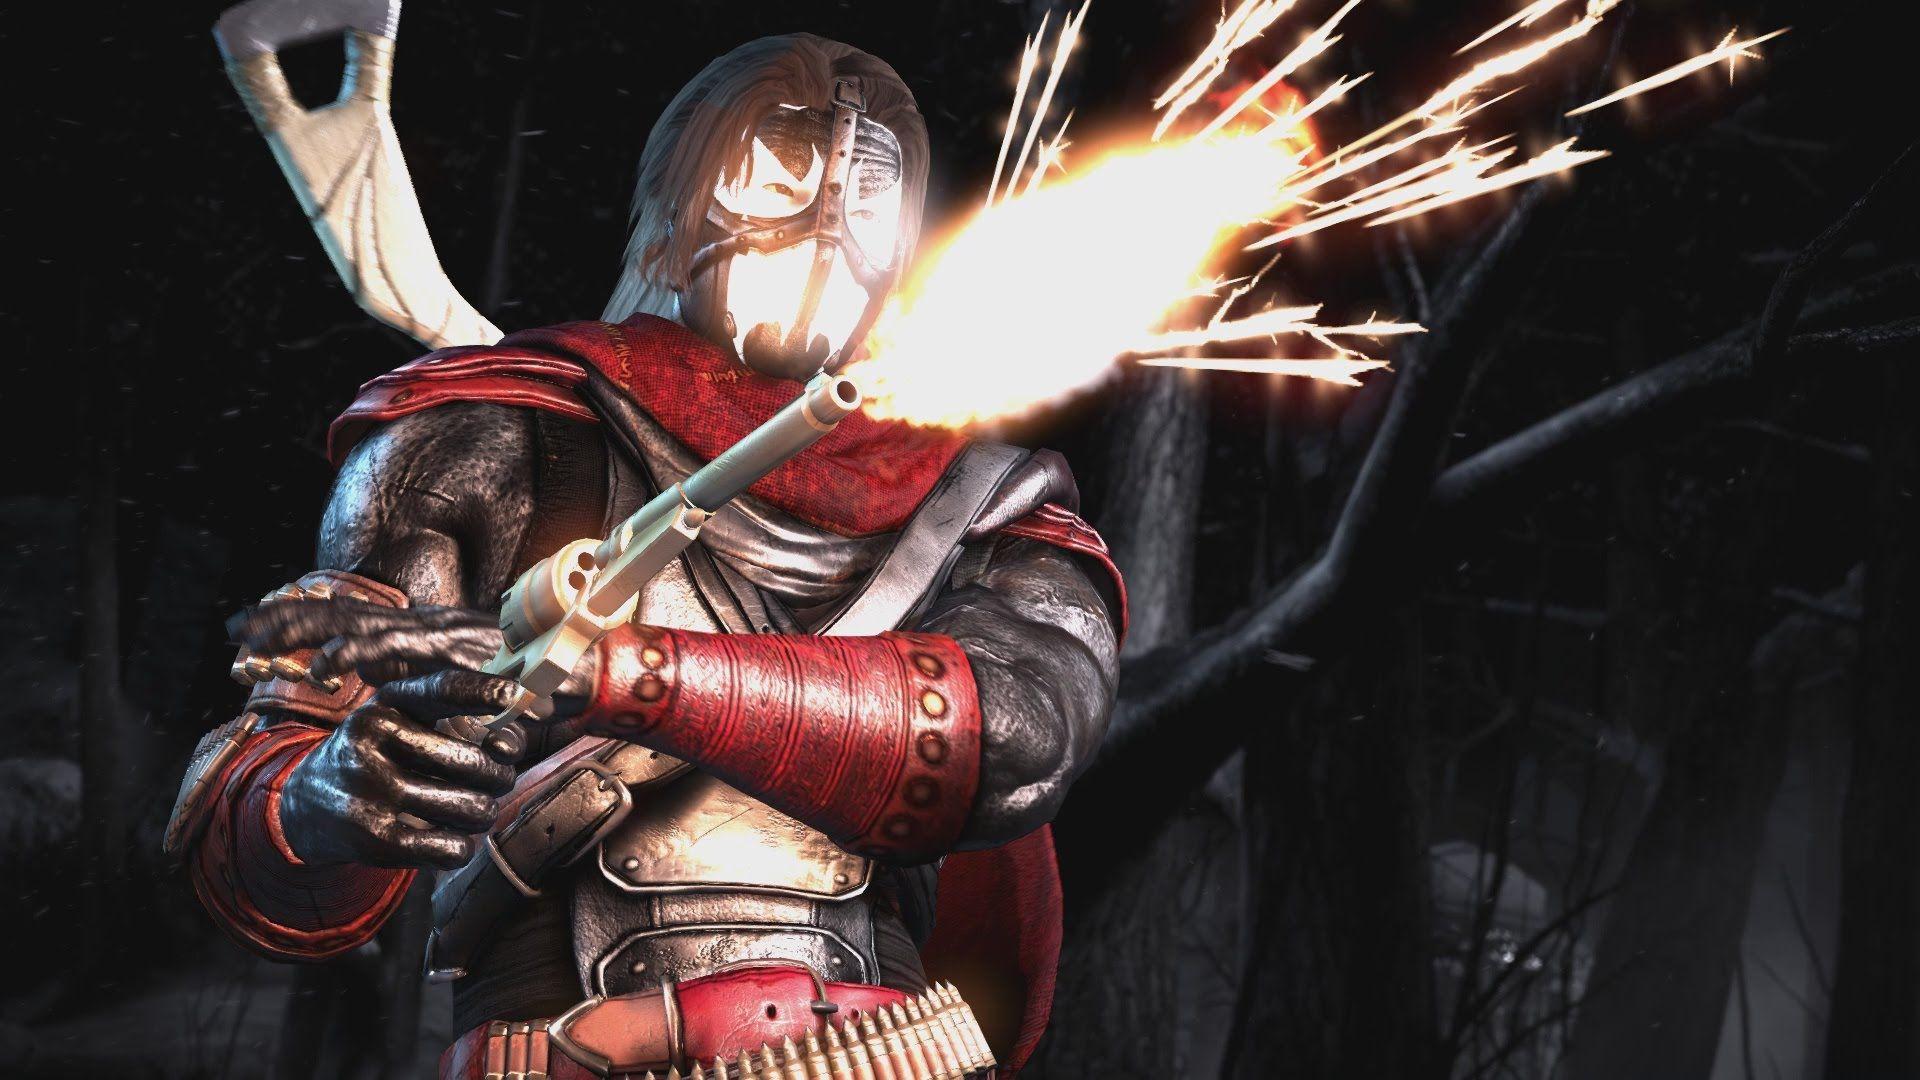 Mortal Kombat X - Erron Black Spawn Costume / Skin PC Mod